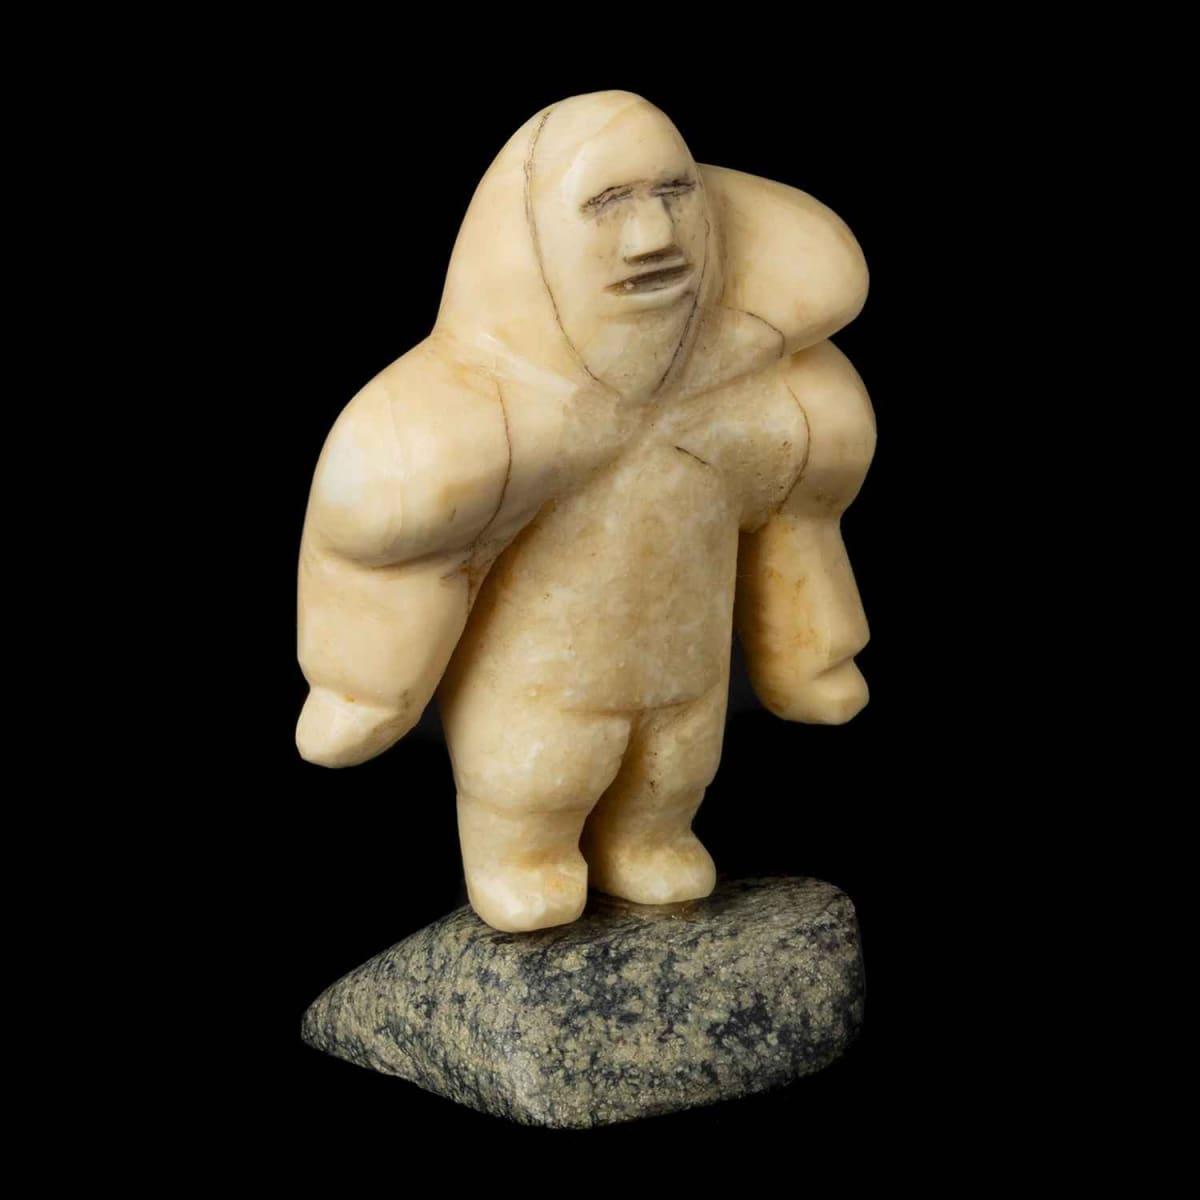 13. Possibly: MATHEW KUROK (1940-), NAUJAAT (REPULSE BAY) Woman in an Amautiq, 1963